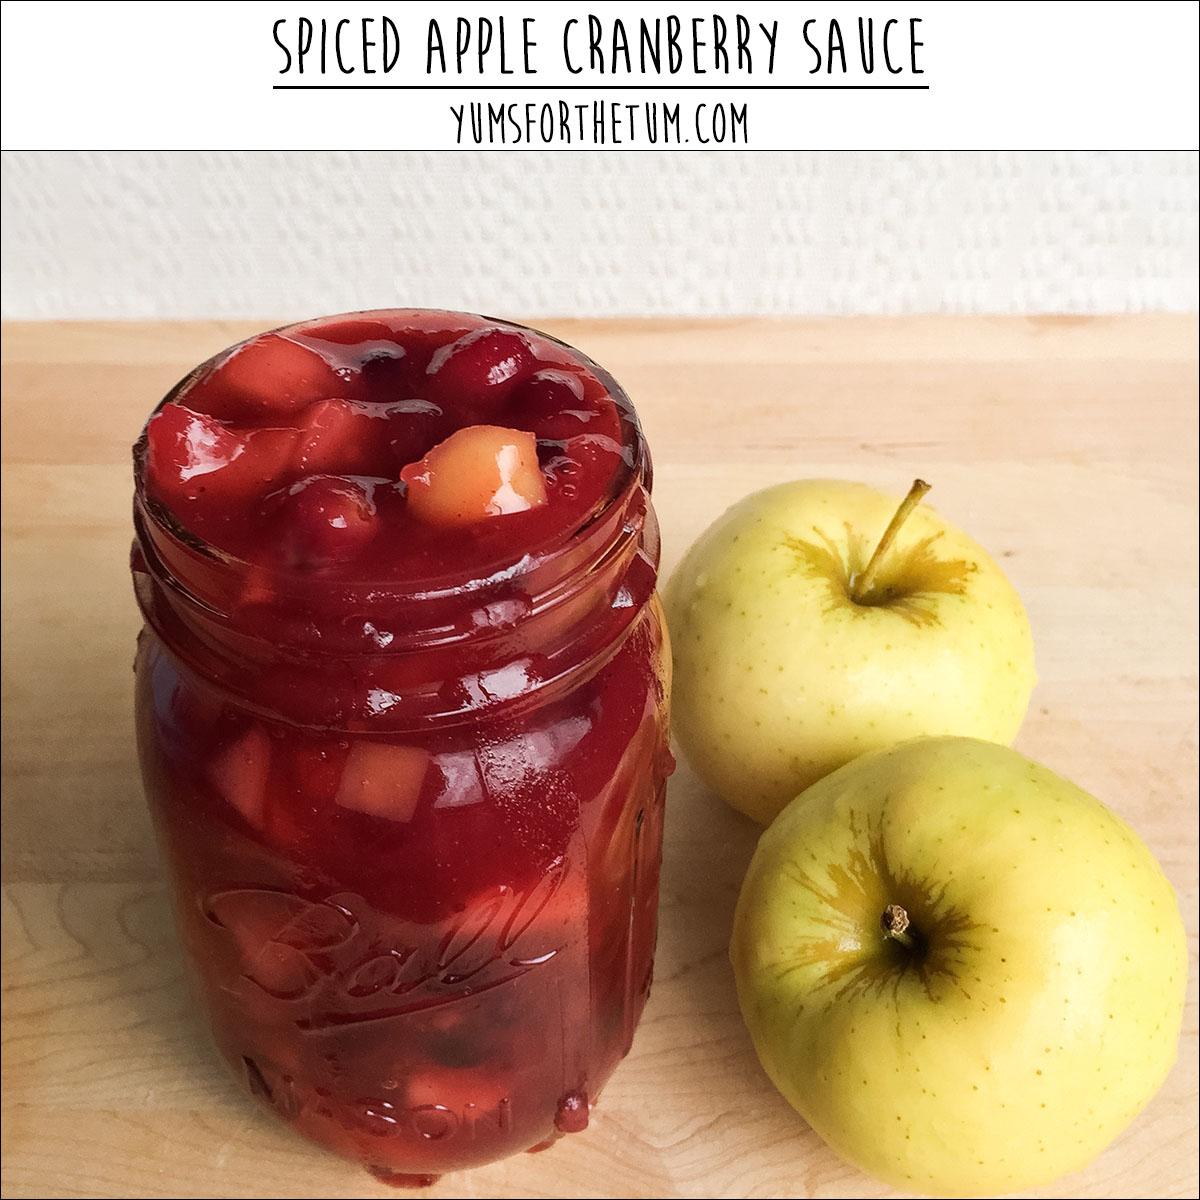 Spiced Apple Cranberry Sauce